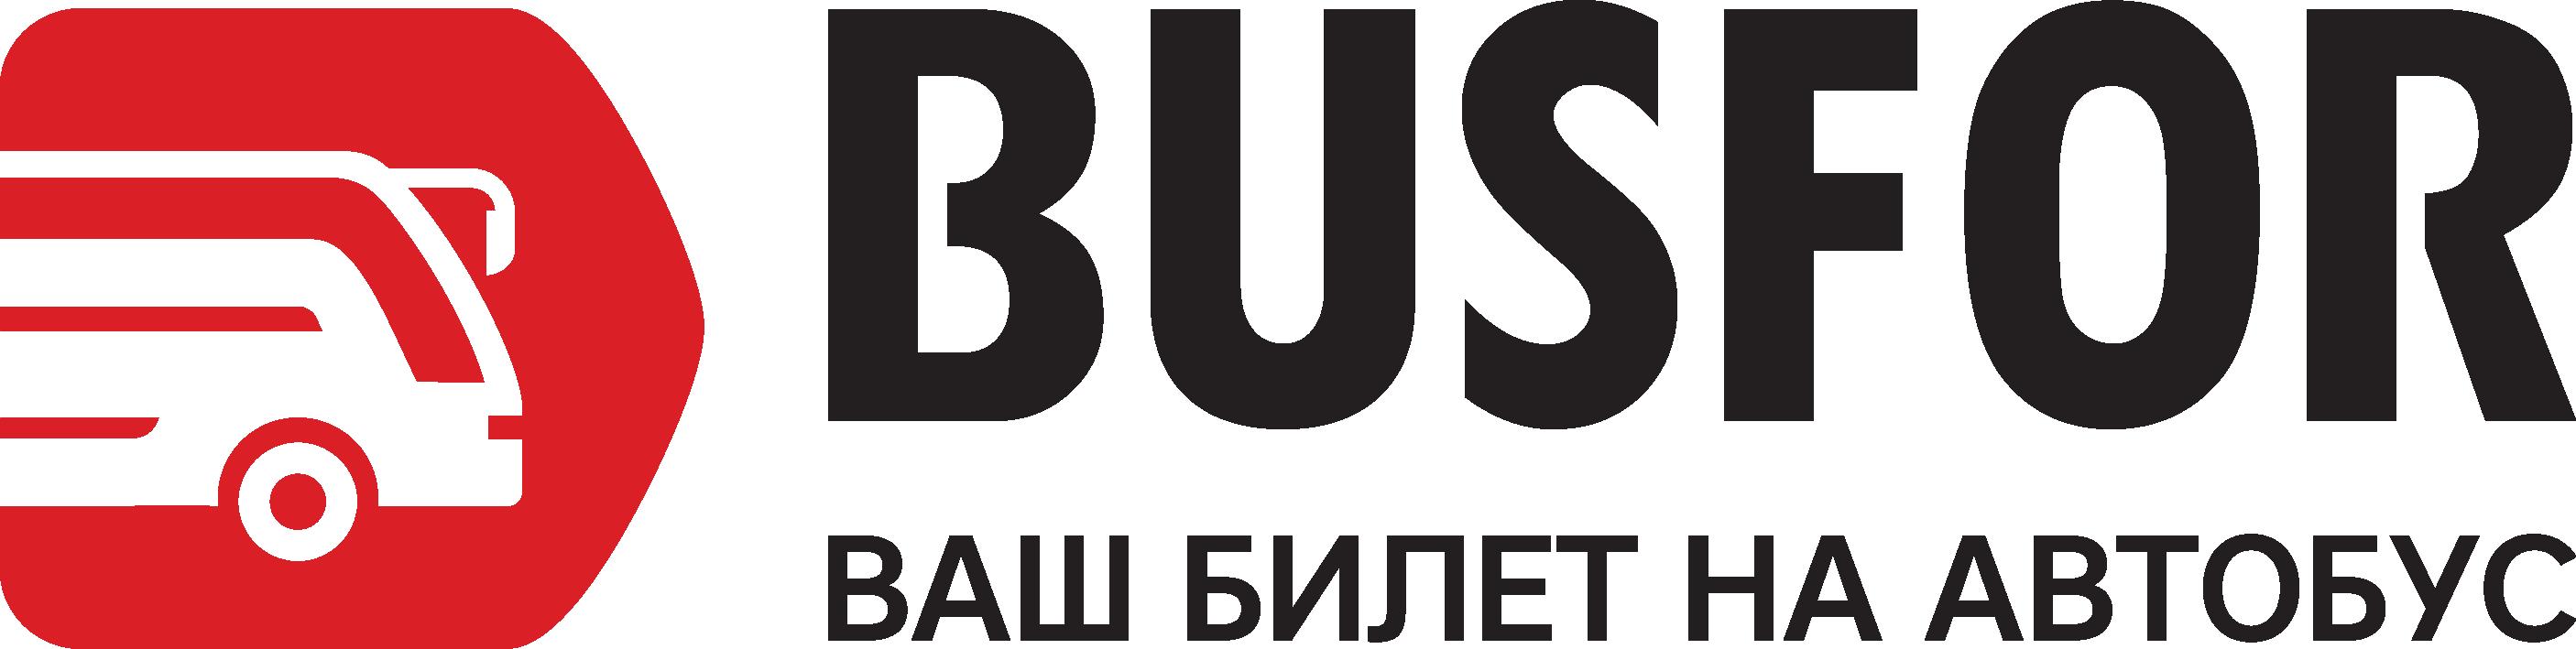 Busfor.ua